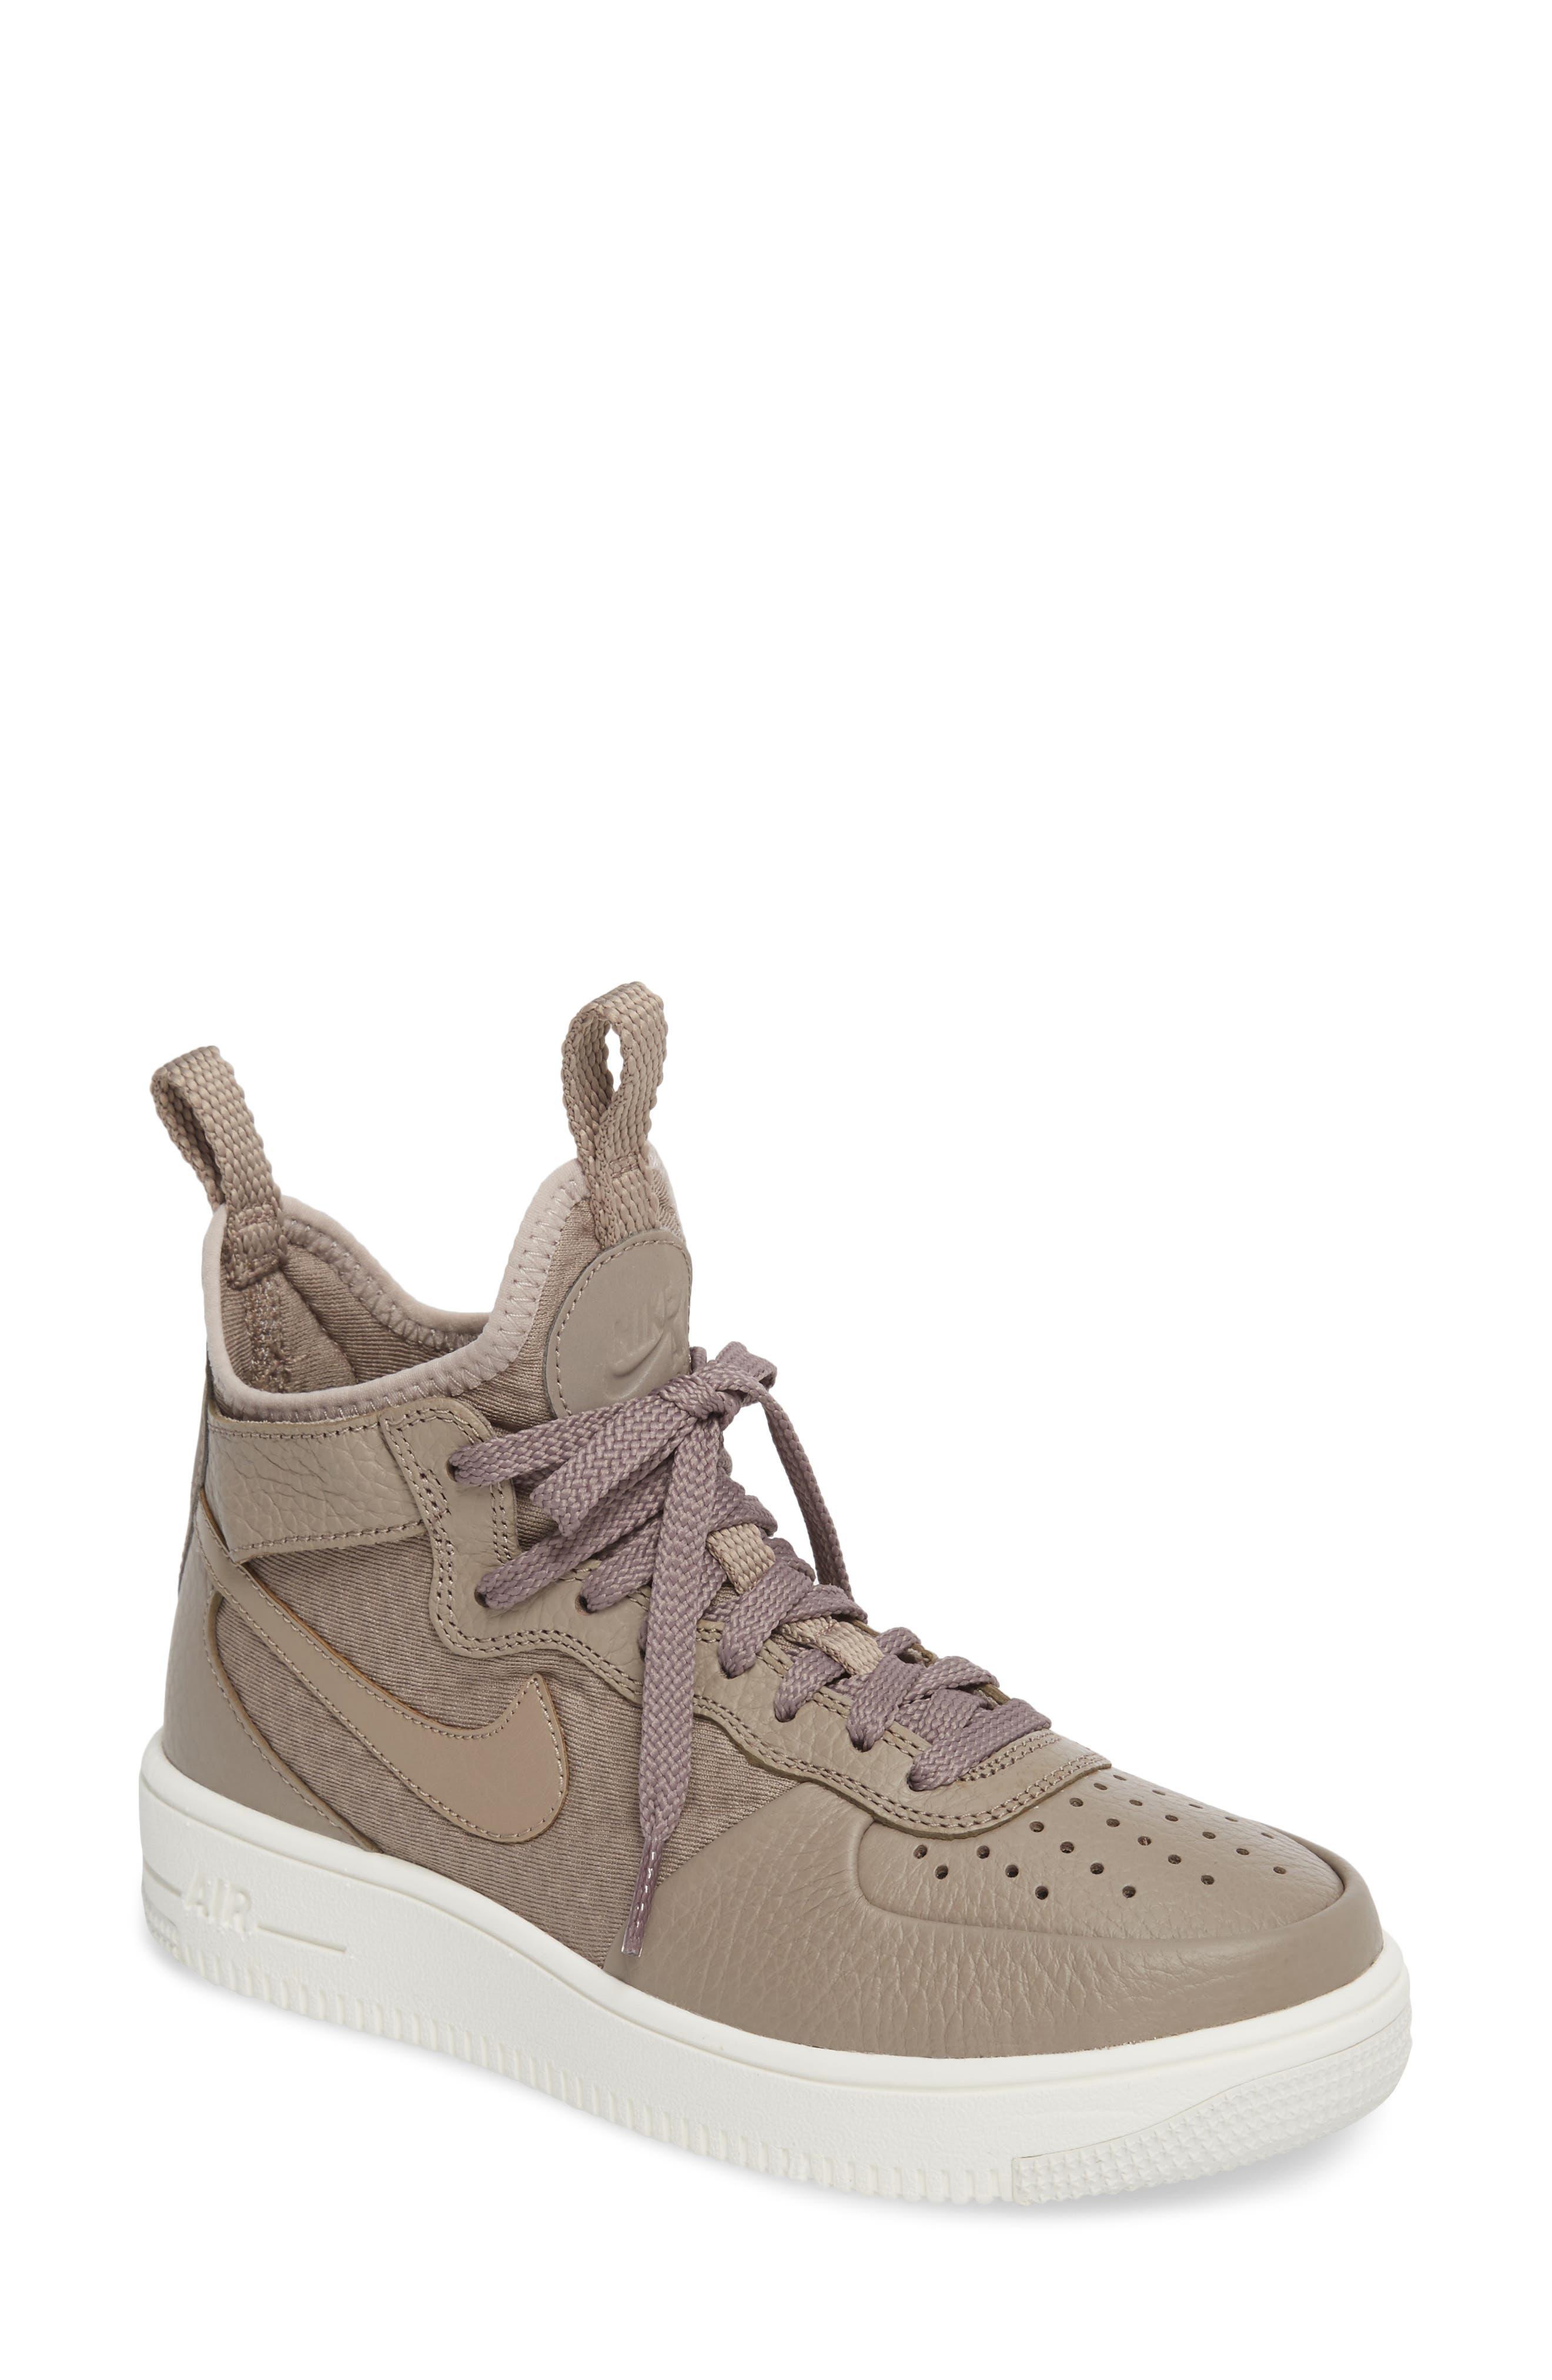 Air Force 1 Ultraforce Mid Sneaker,                             Main thumbnail 1, color,                             022